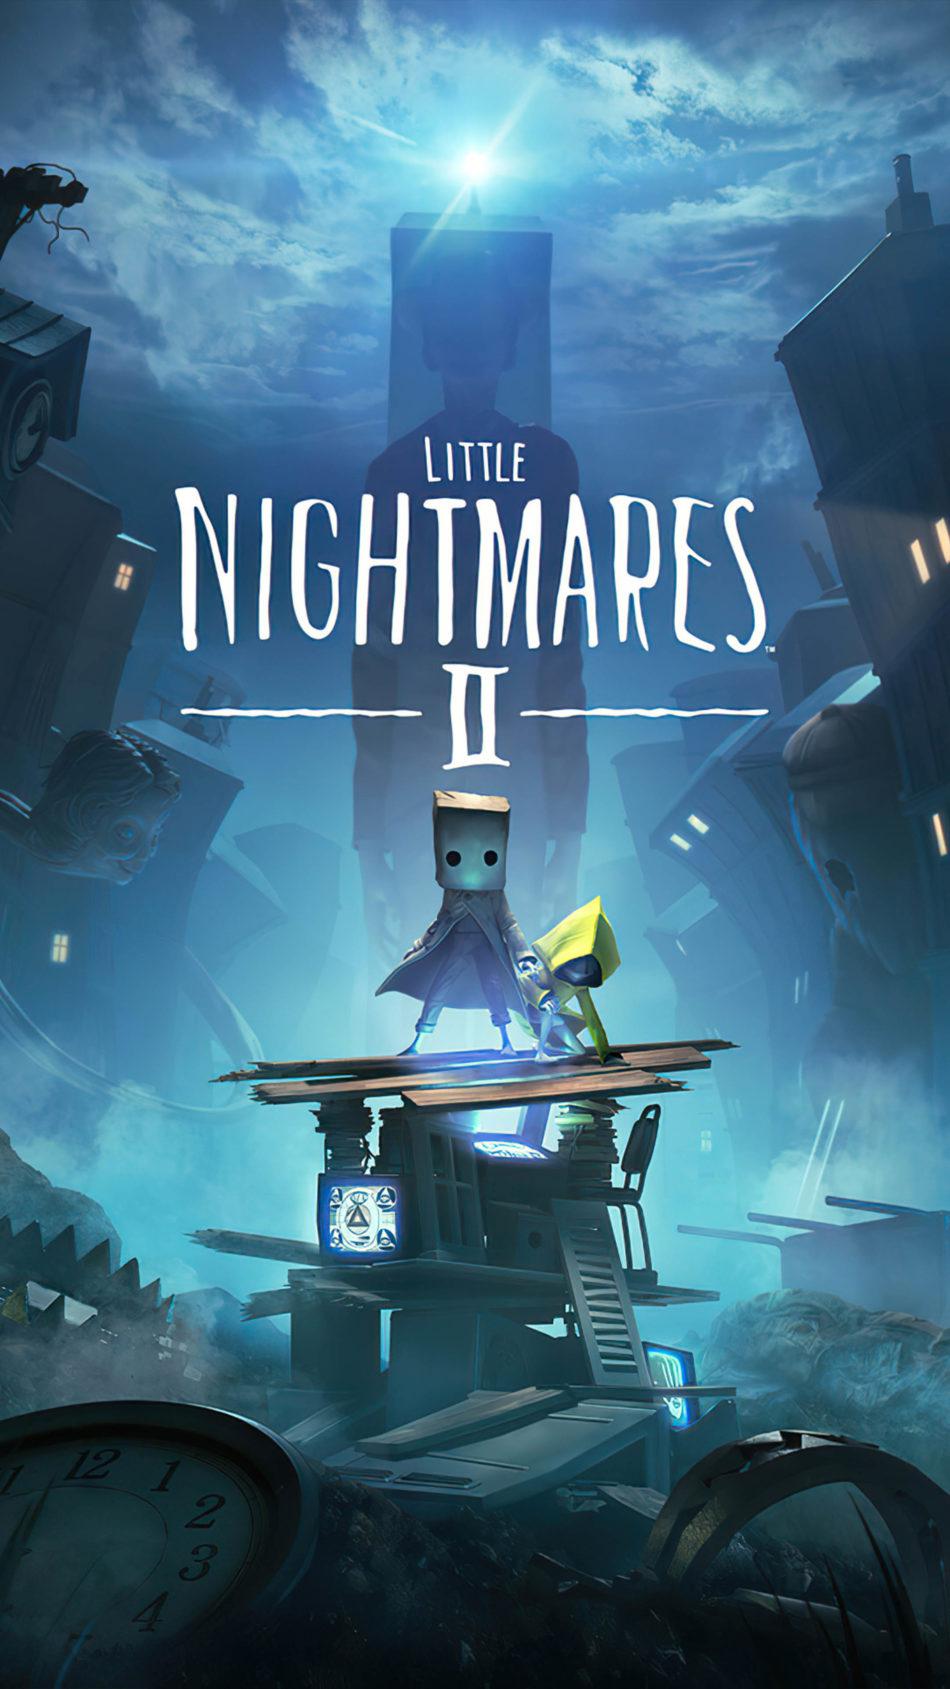 Little Nightmares 2 Game Poster 4K Ultra HD Mobile Wallpaper